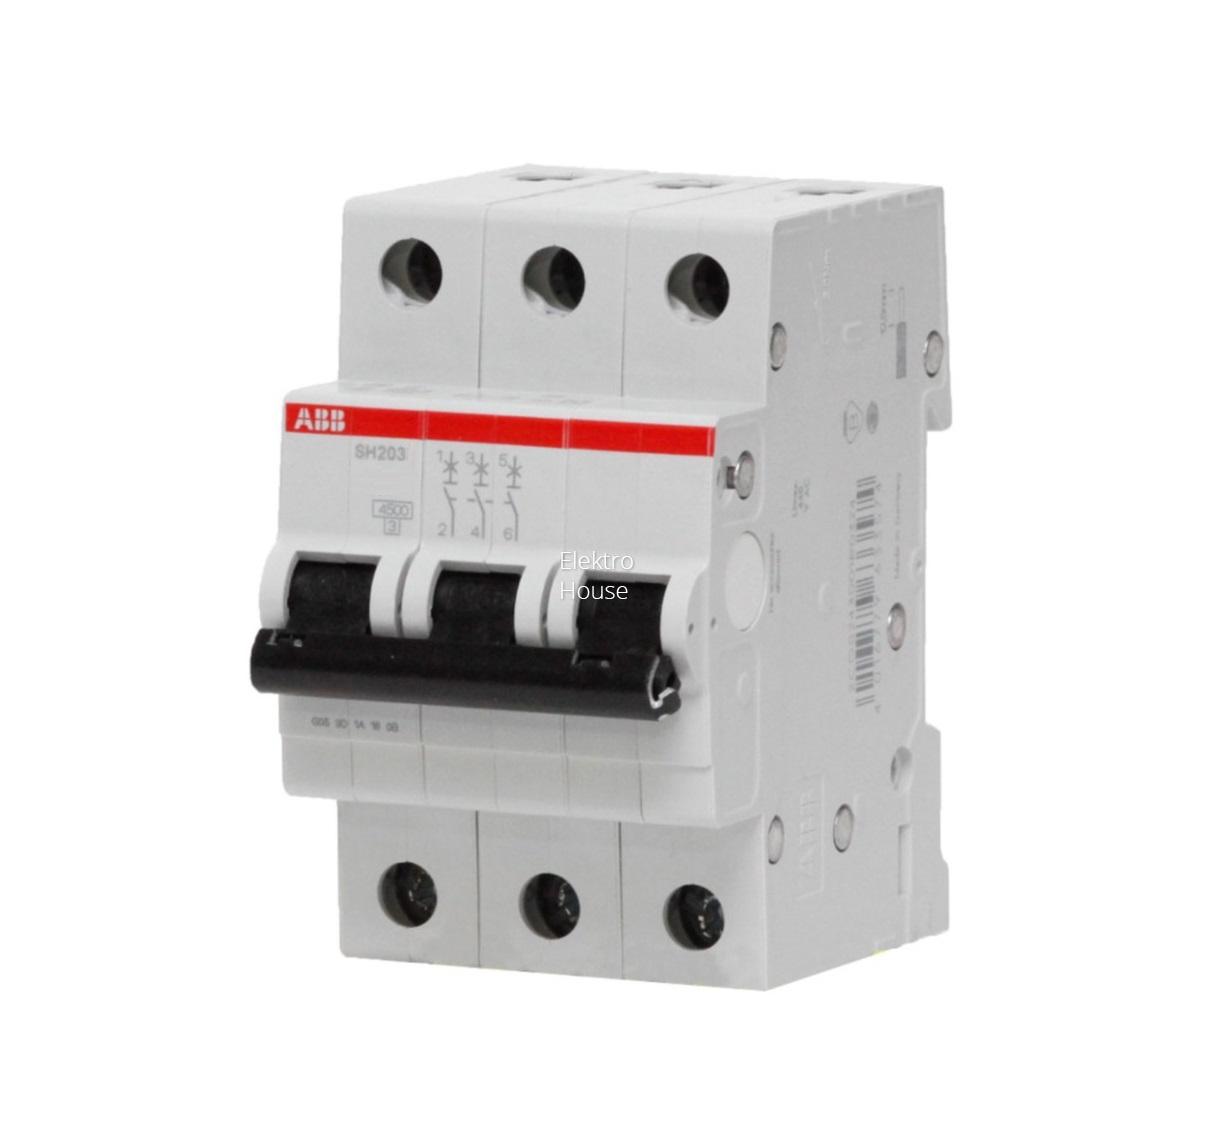 Выключатель Abb 2cds213001r0324 выключатель abb 2csr145001r1064